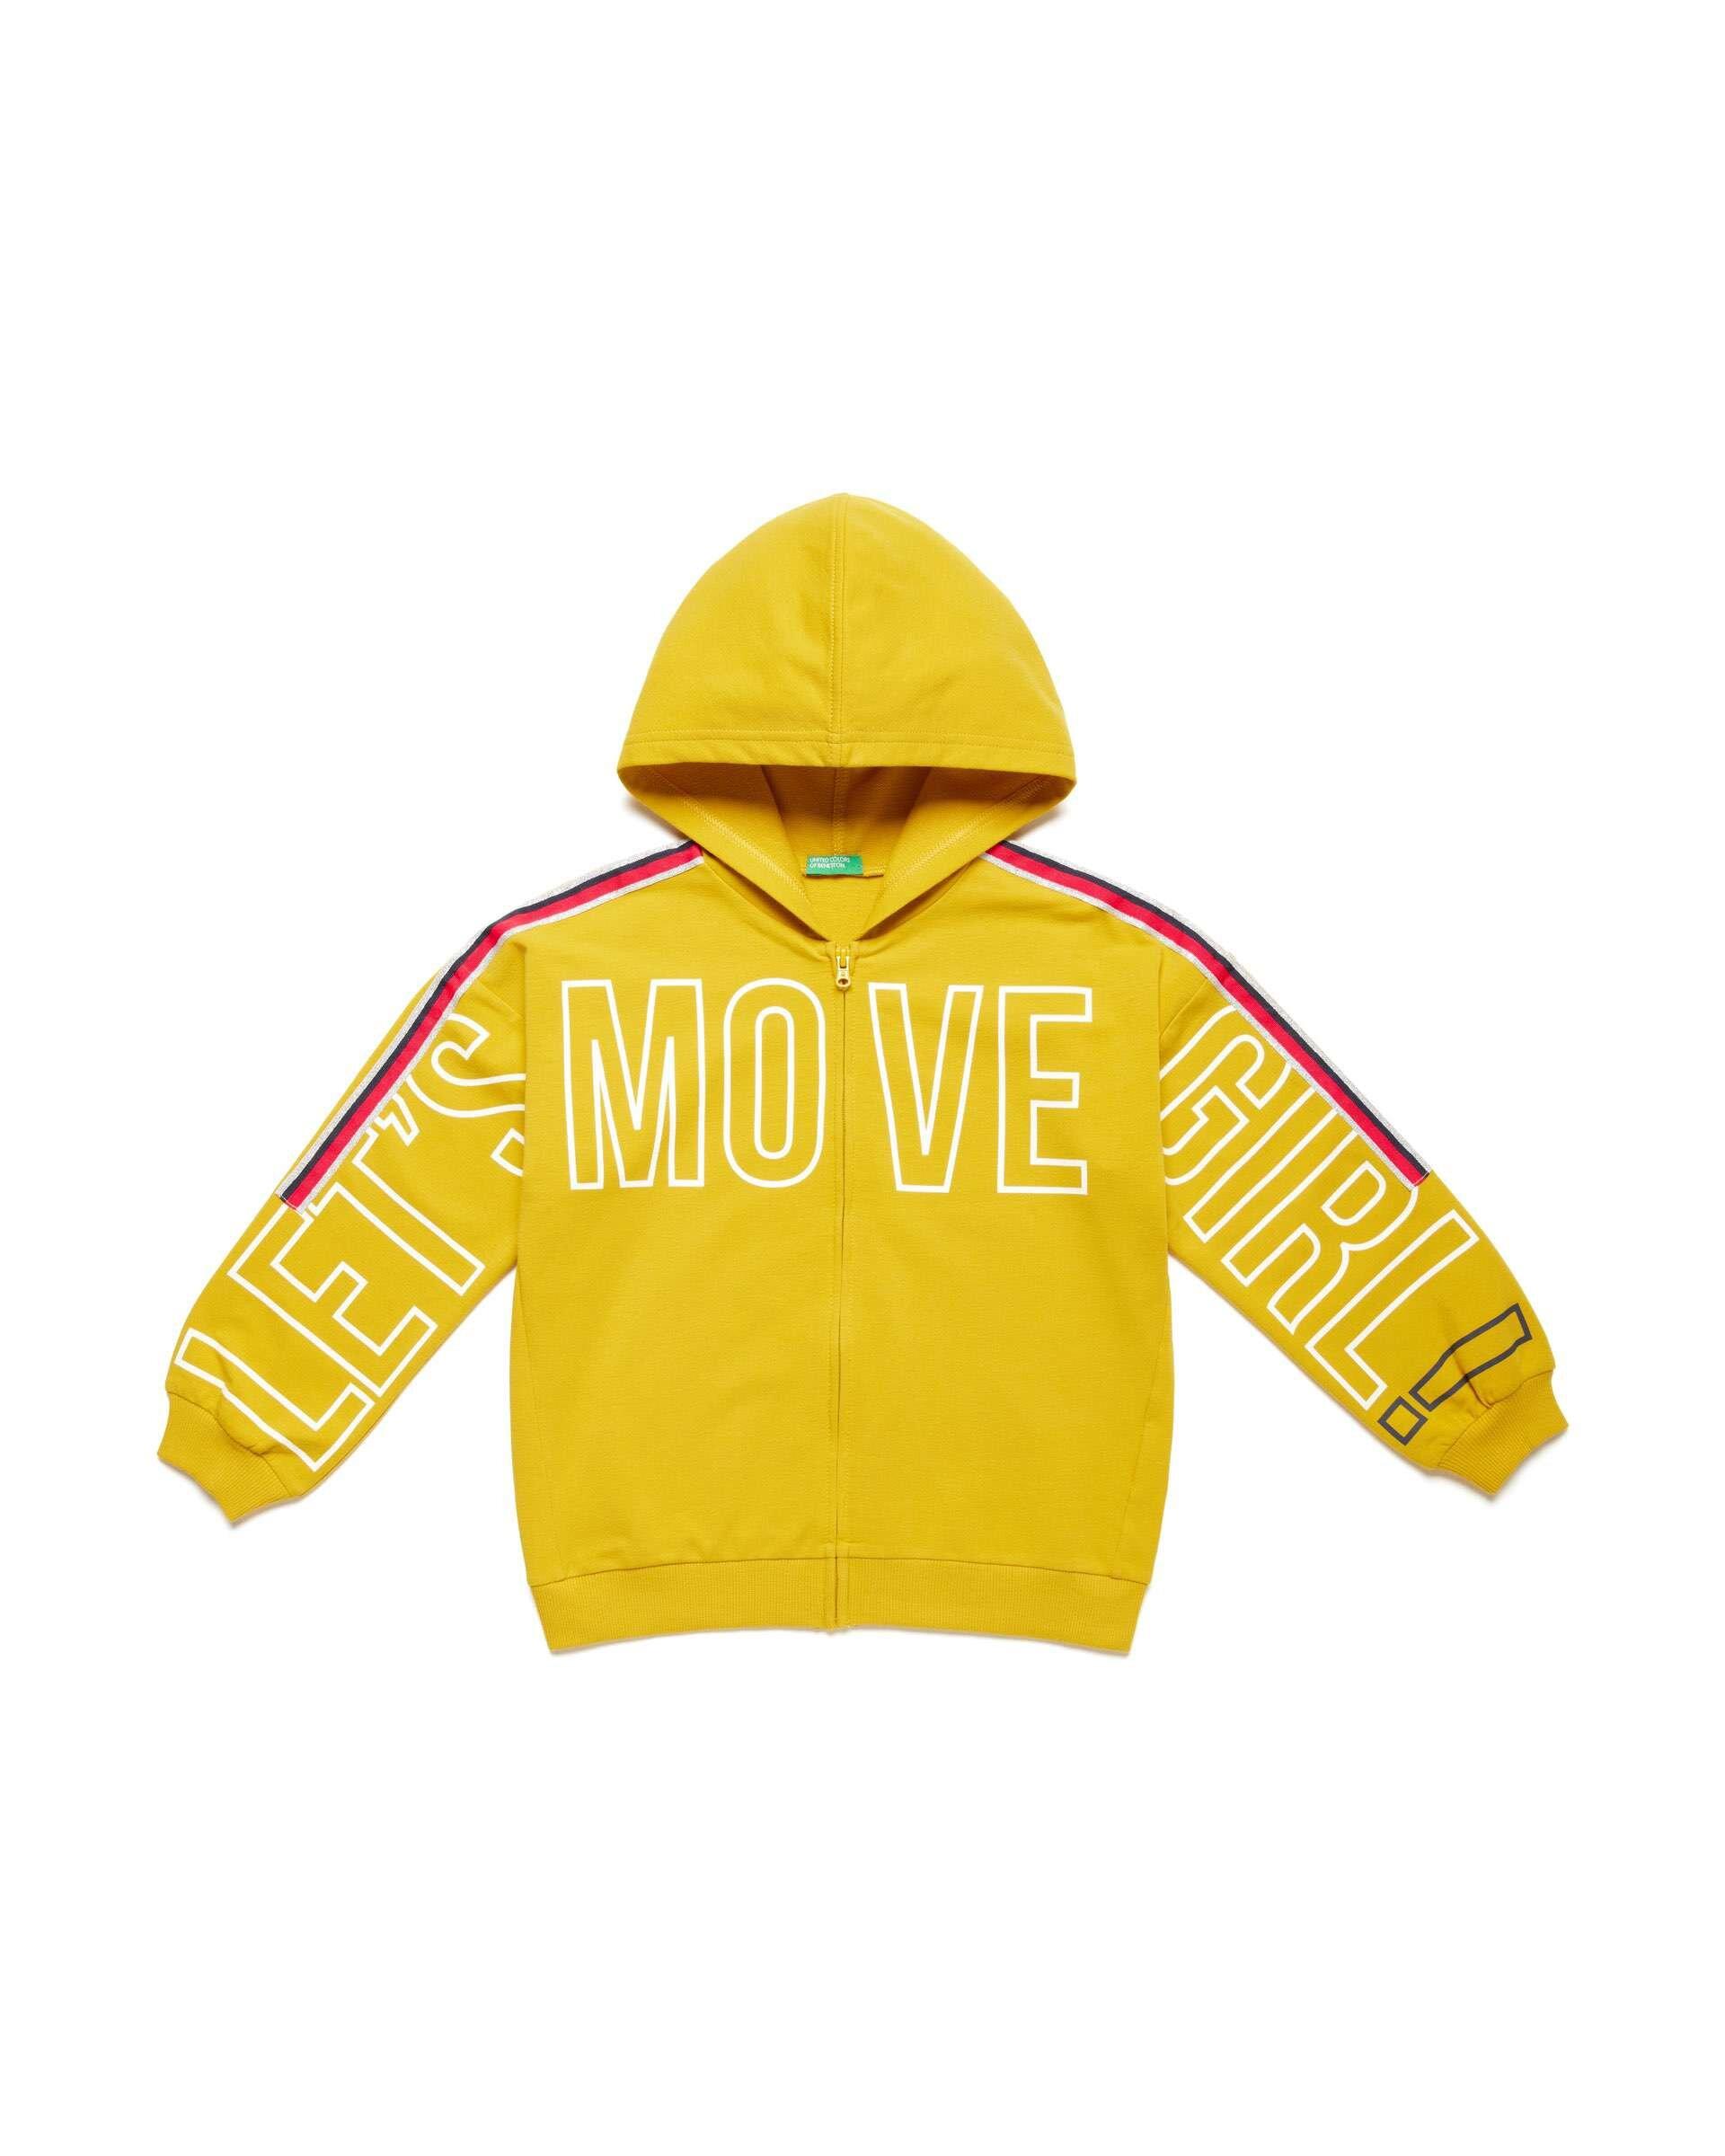 Move Your Love Sweatshirt